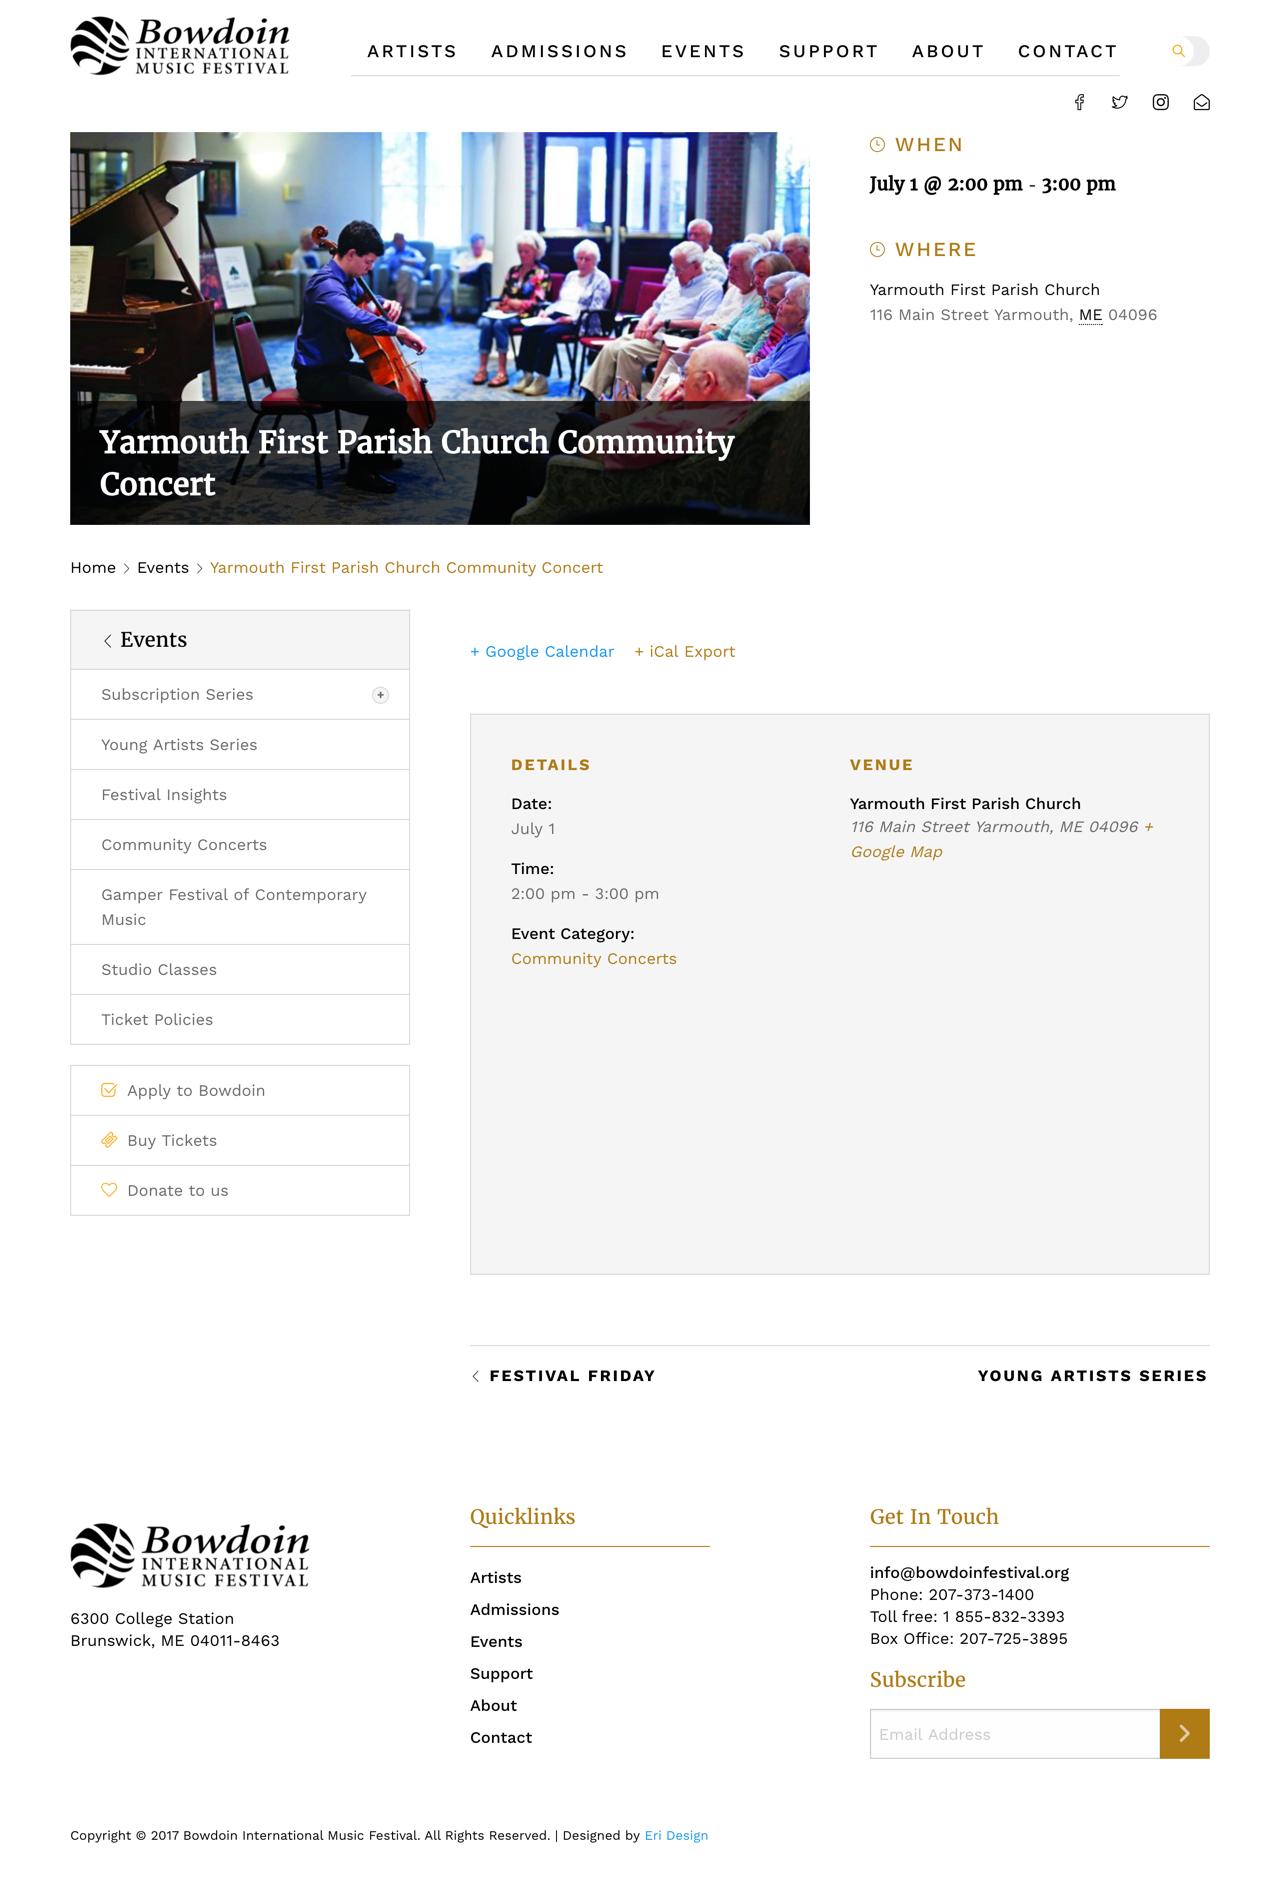 Bowdoin Festival music events listing